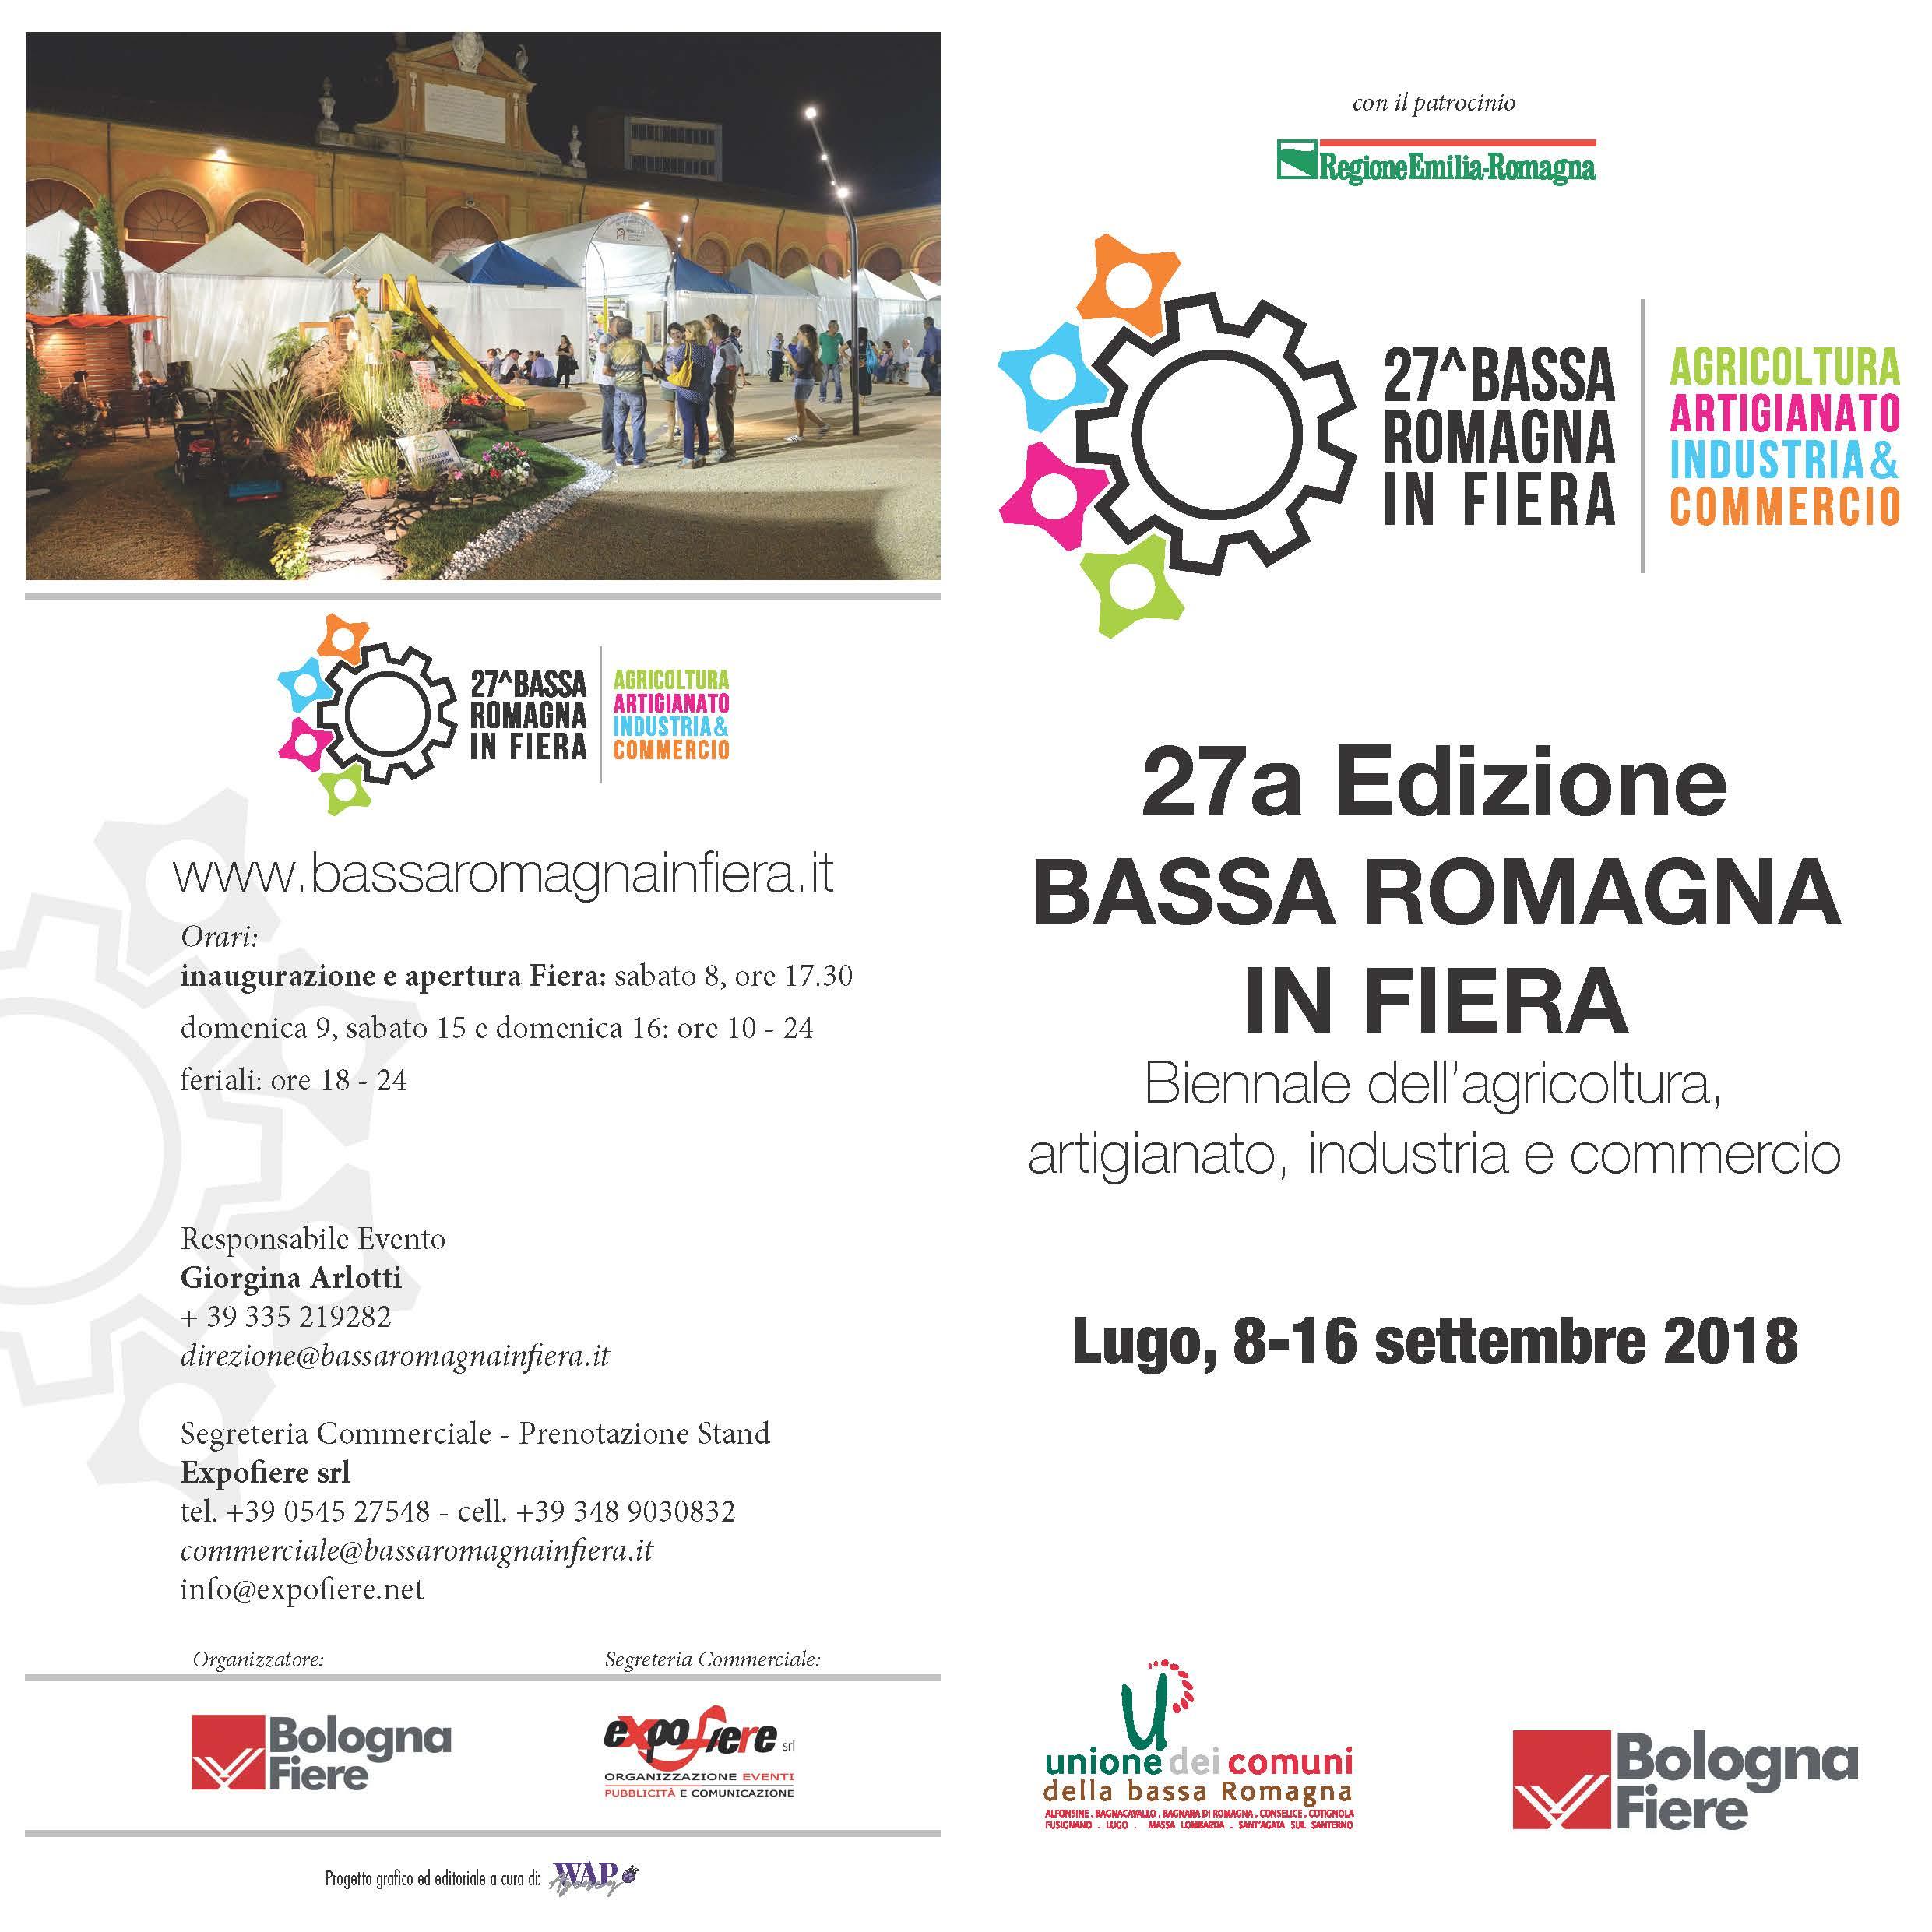 biennale brochure def._Pagina_1